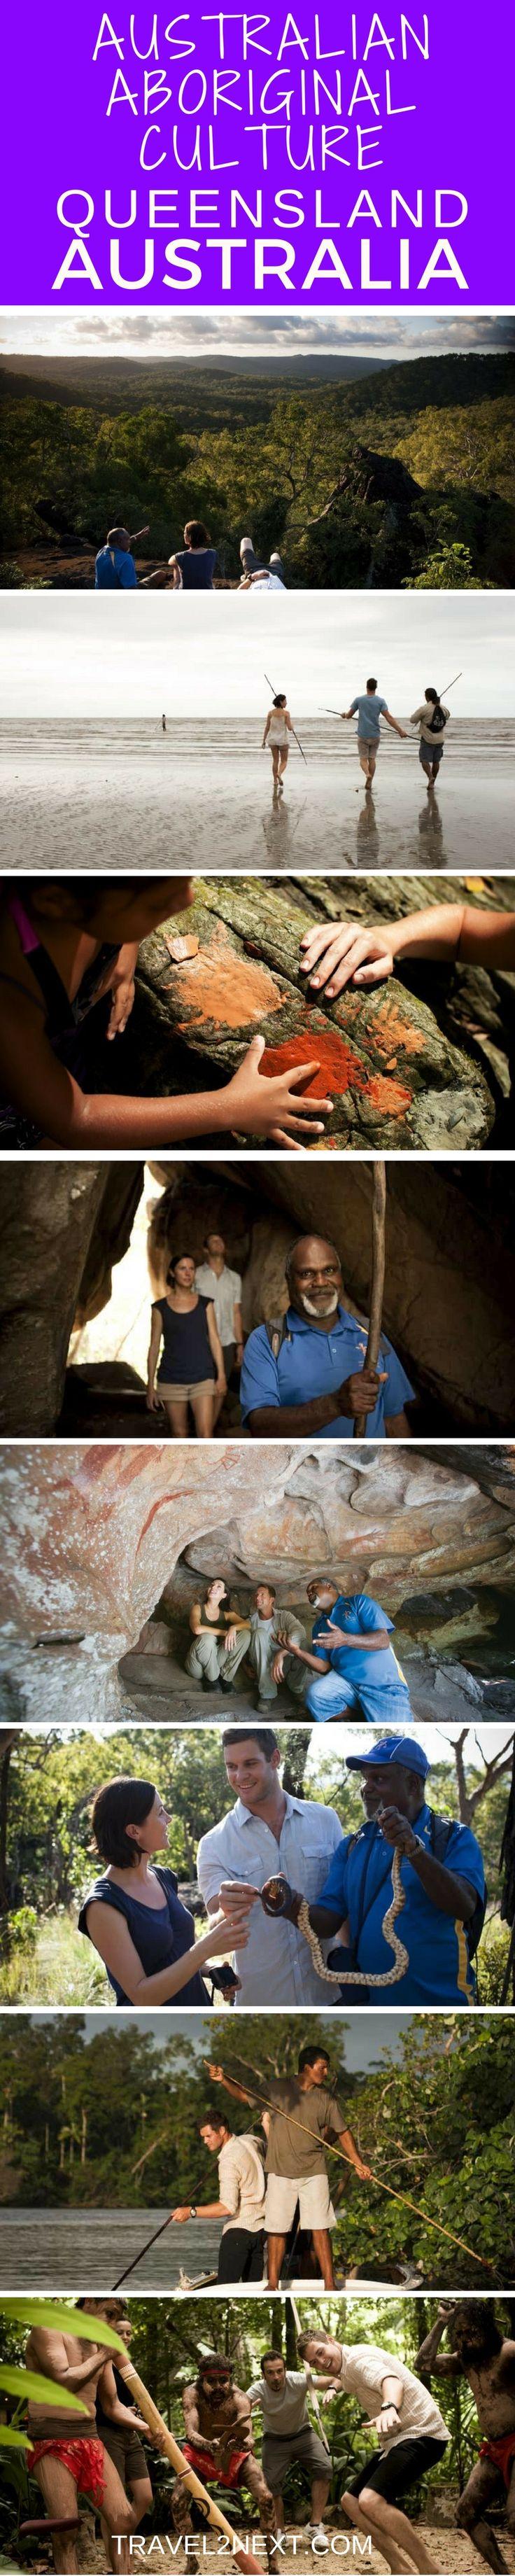 Where to experience Australian aboriginal culture when visiting Australia.